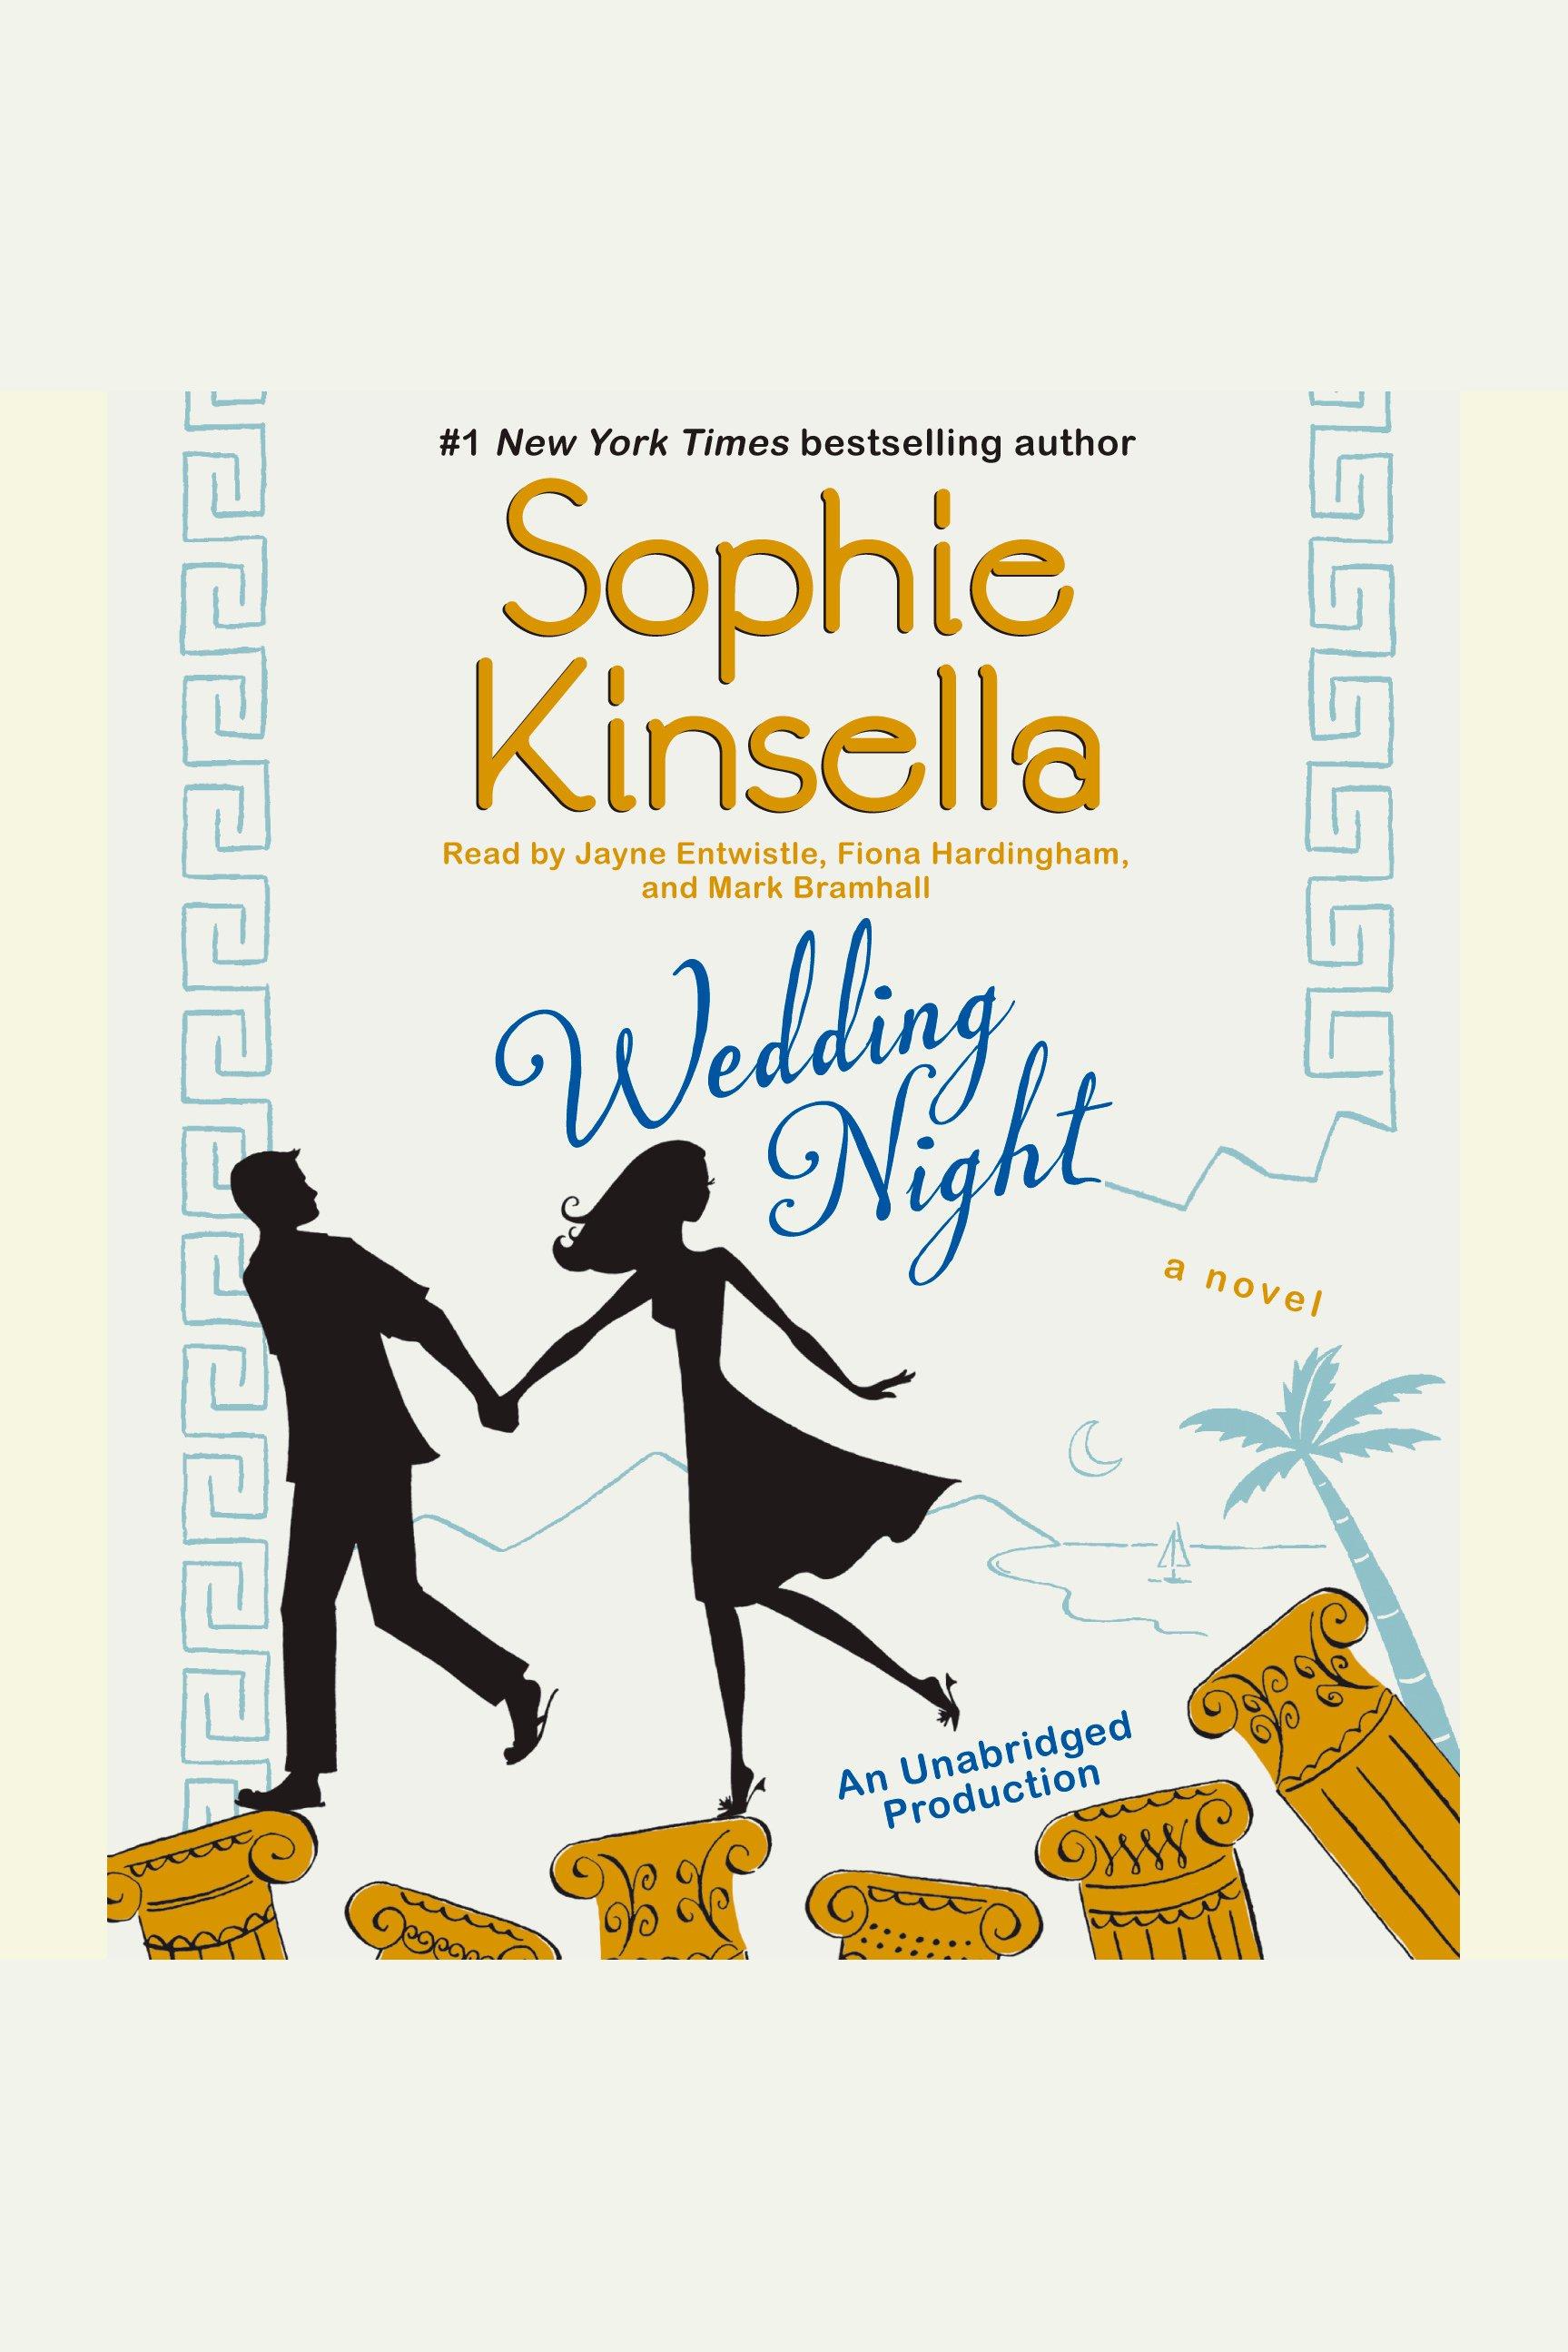 Wedding night cover image